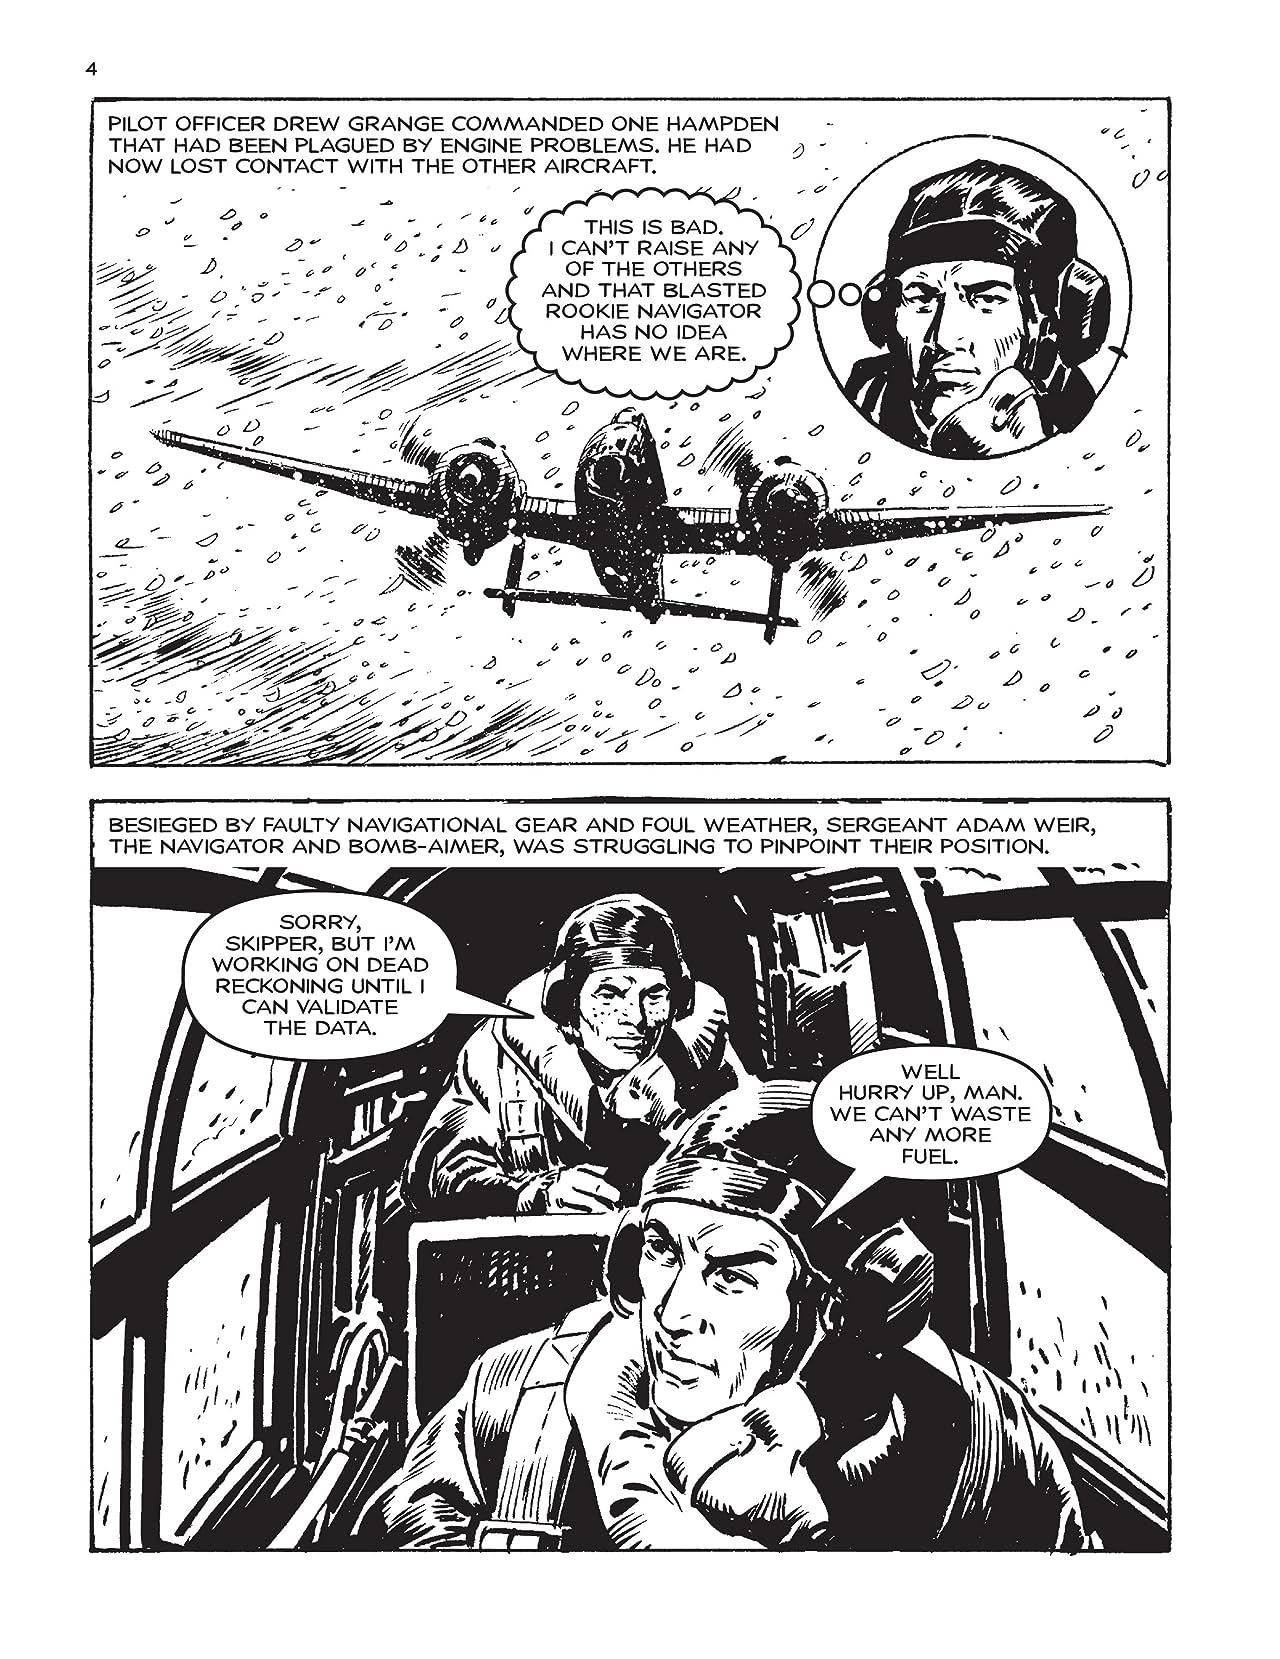 Commando #4943: Ice-Cold Combat